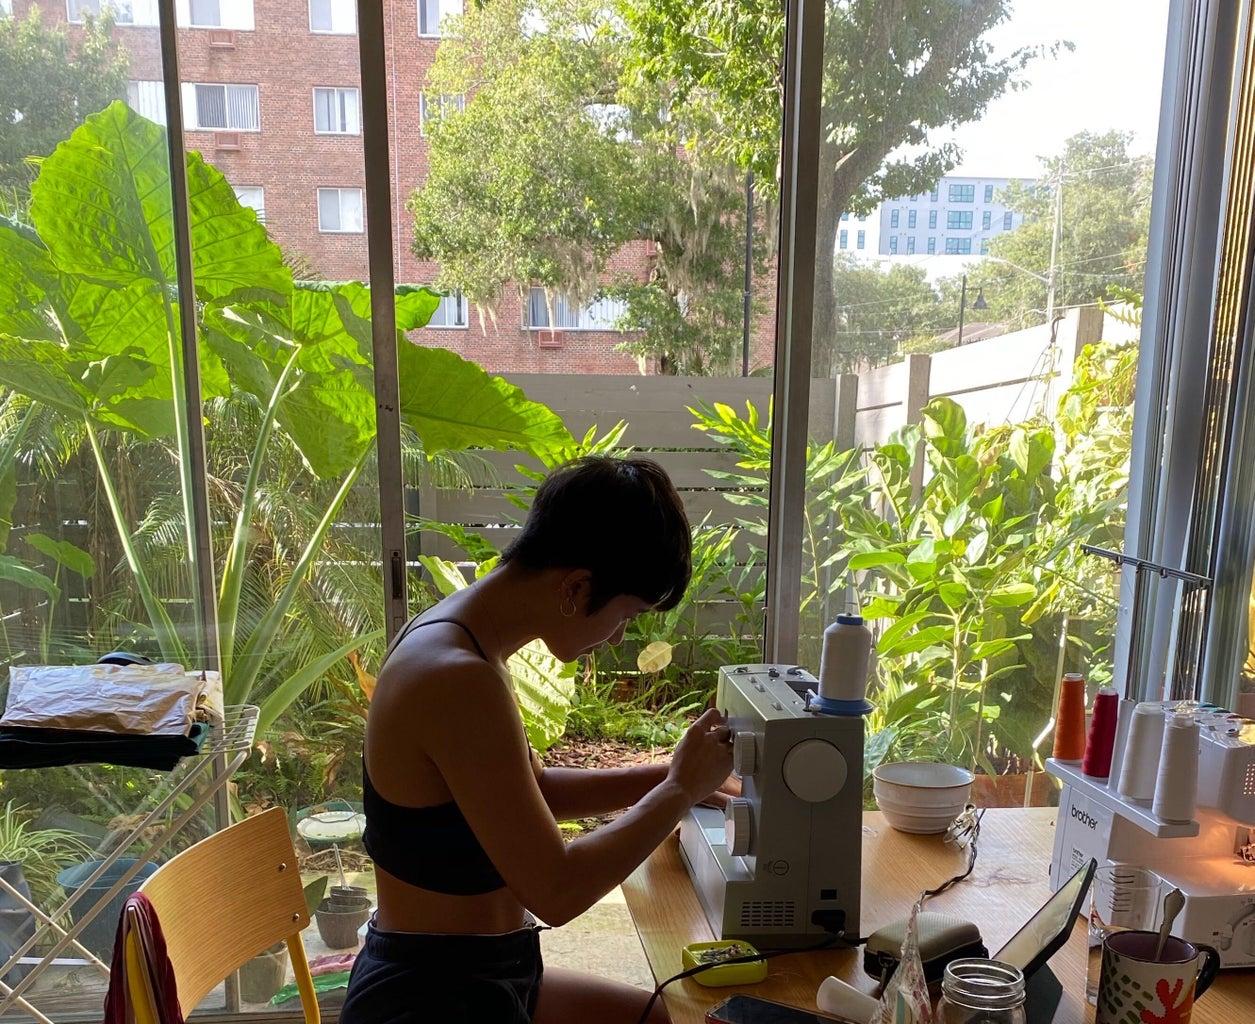 Mia Crisosto working on her sewing machine.